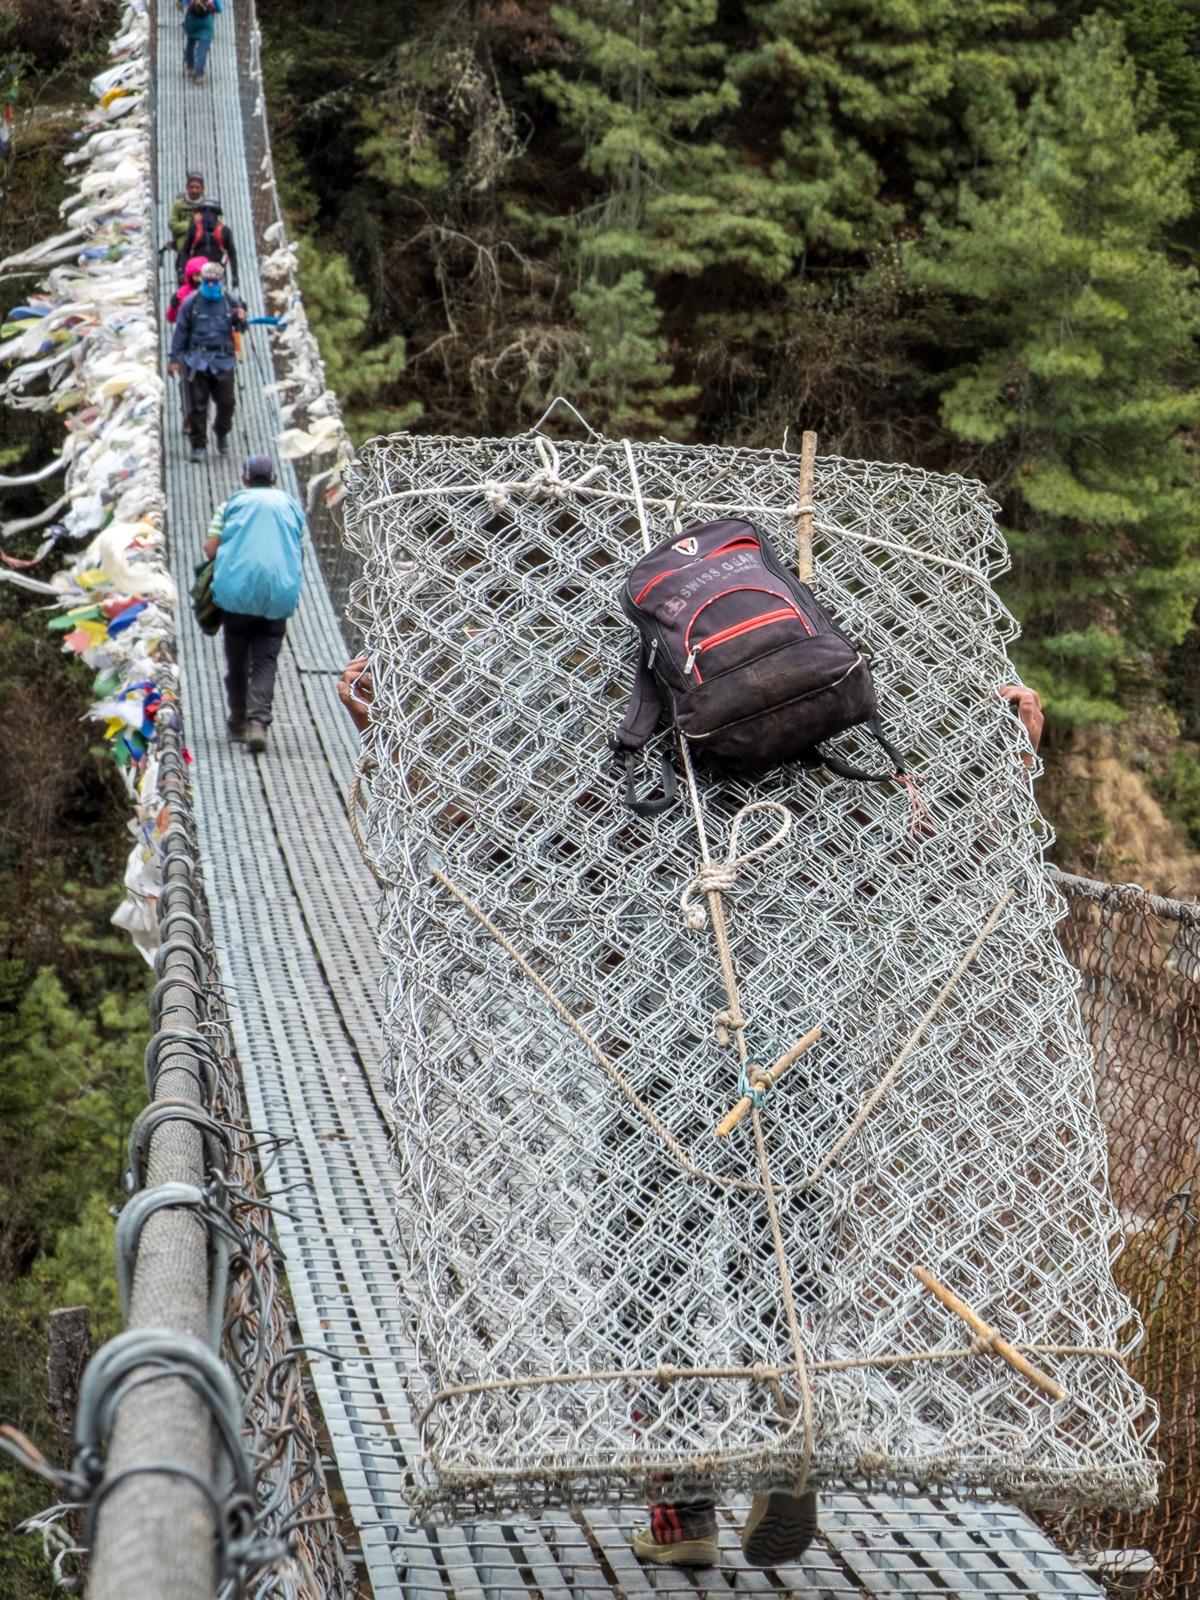 Porter crossing a suspension bridge, Nepal.